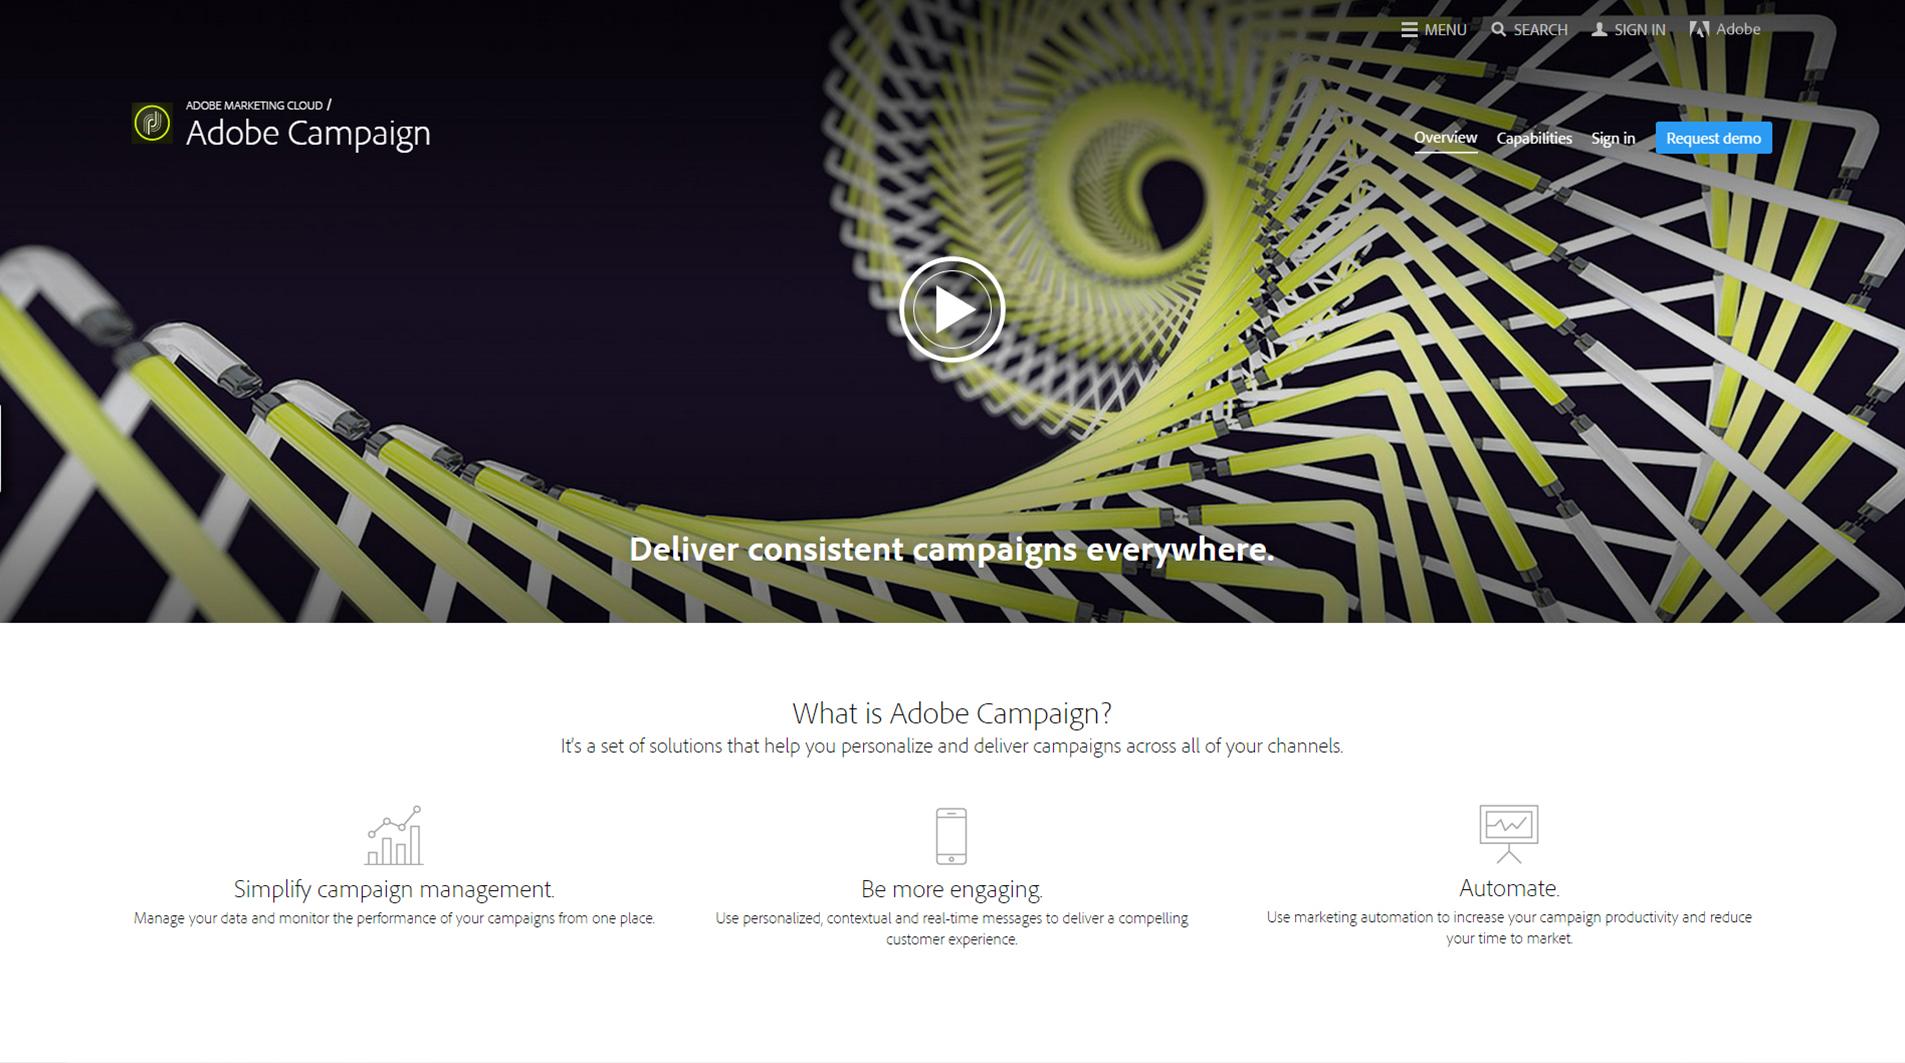 Adobe_Campaign_01.jpg